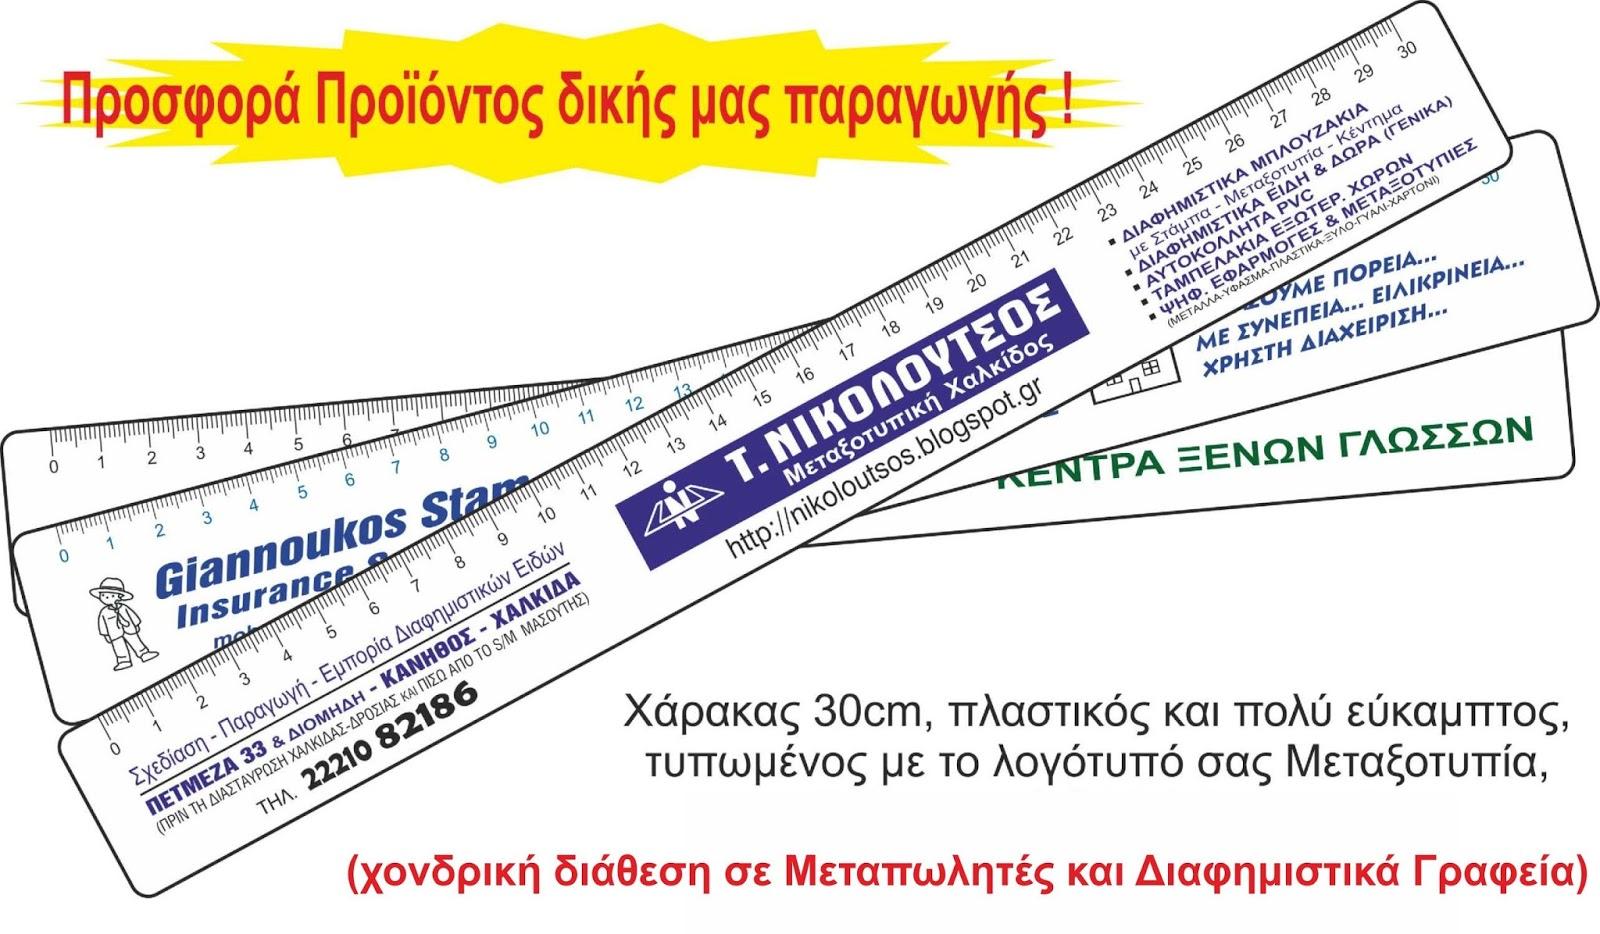 deb486c580ec Μεταξοτυπικη Χαλκιδος   Αγιων Αναργυρων Αθηνα - Τ. Νικολουτσος LASER ...